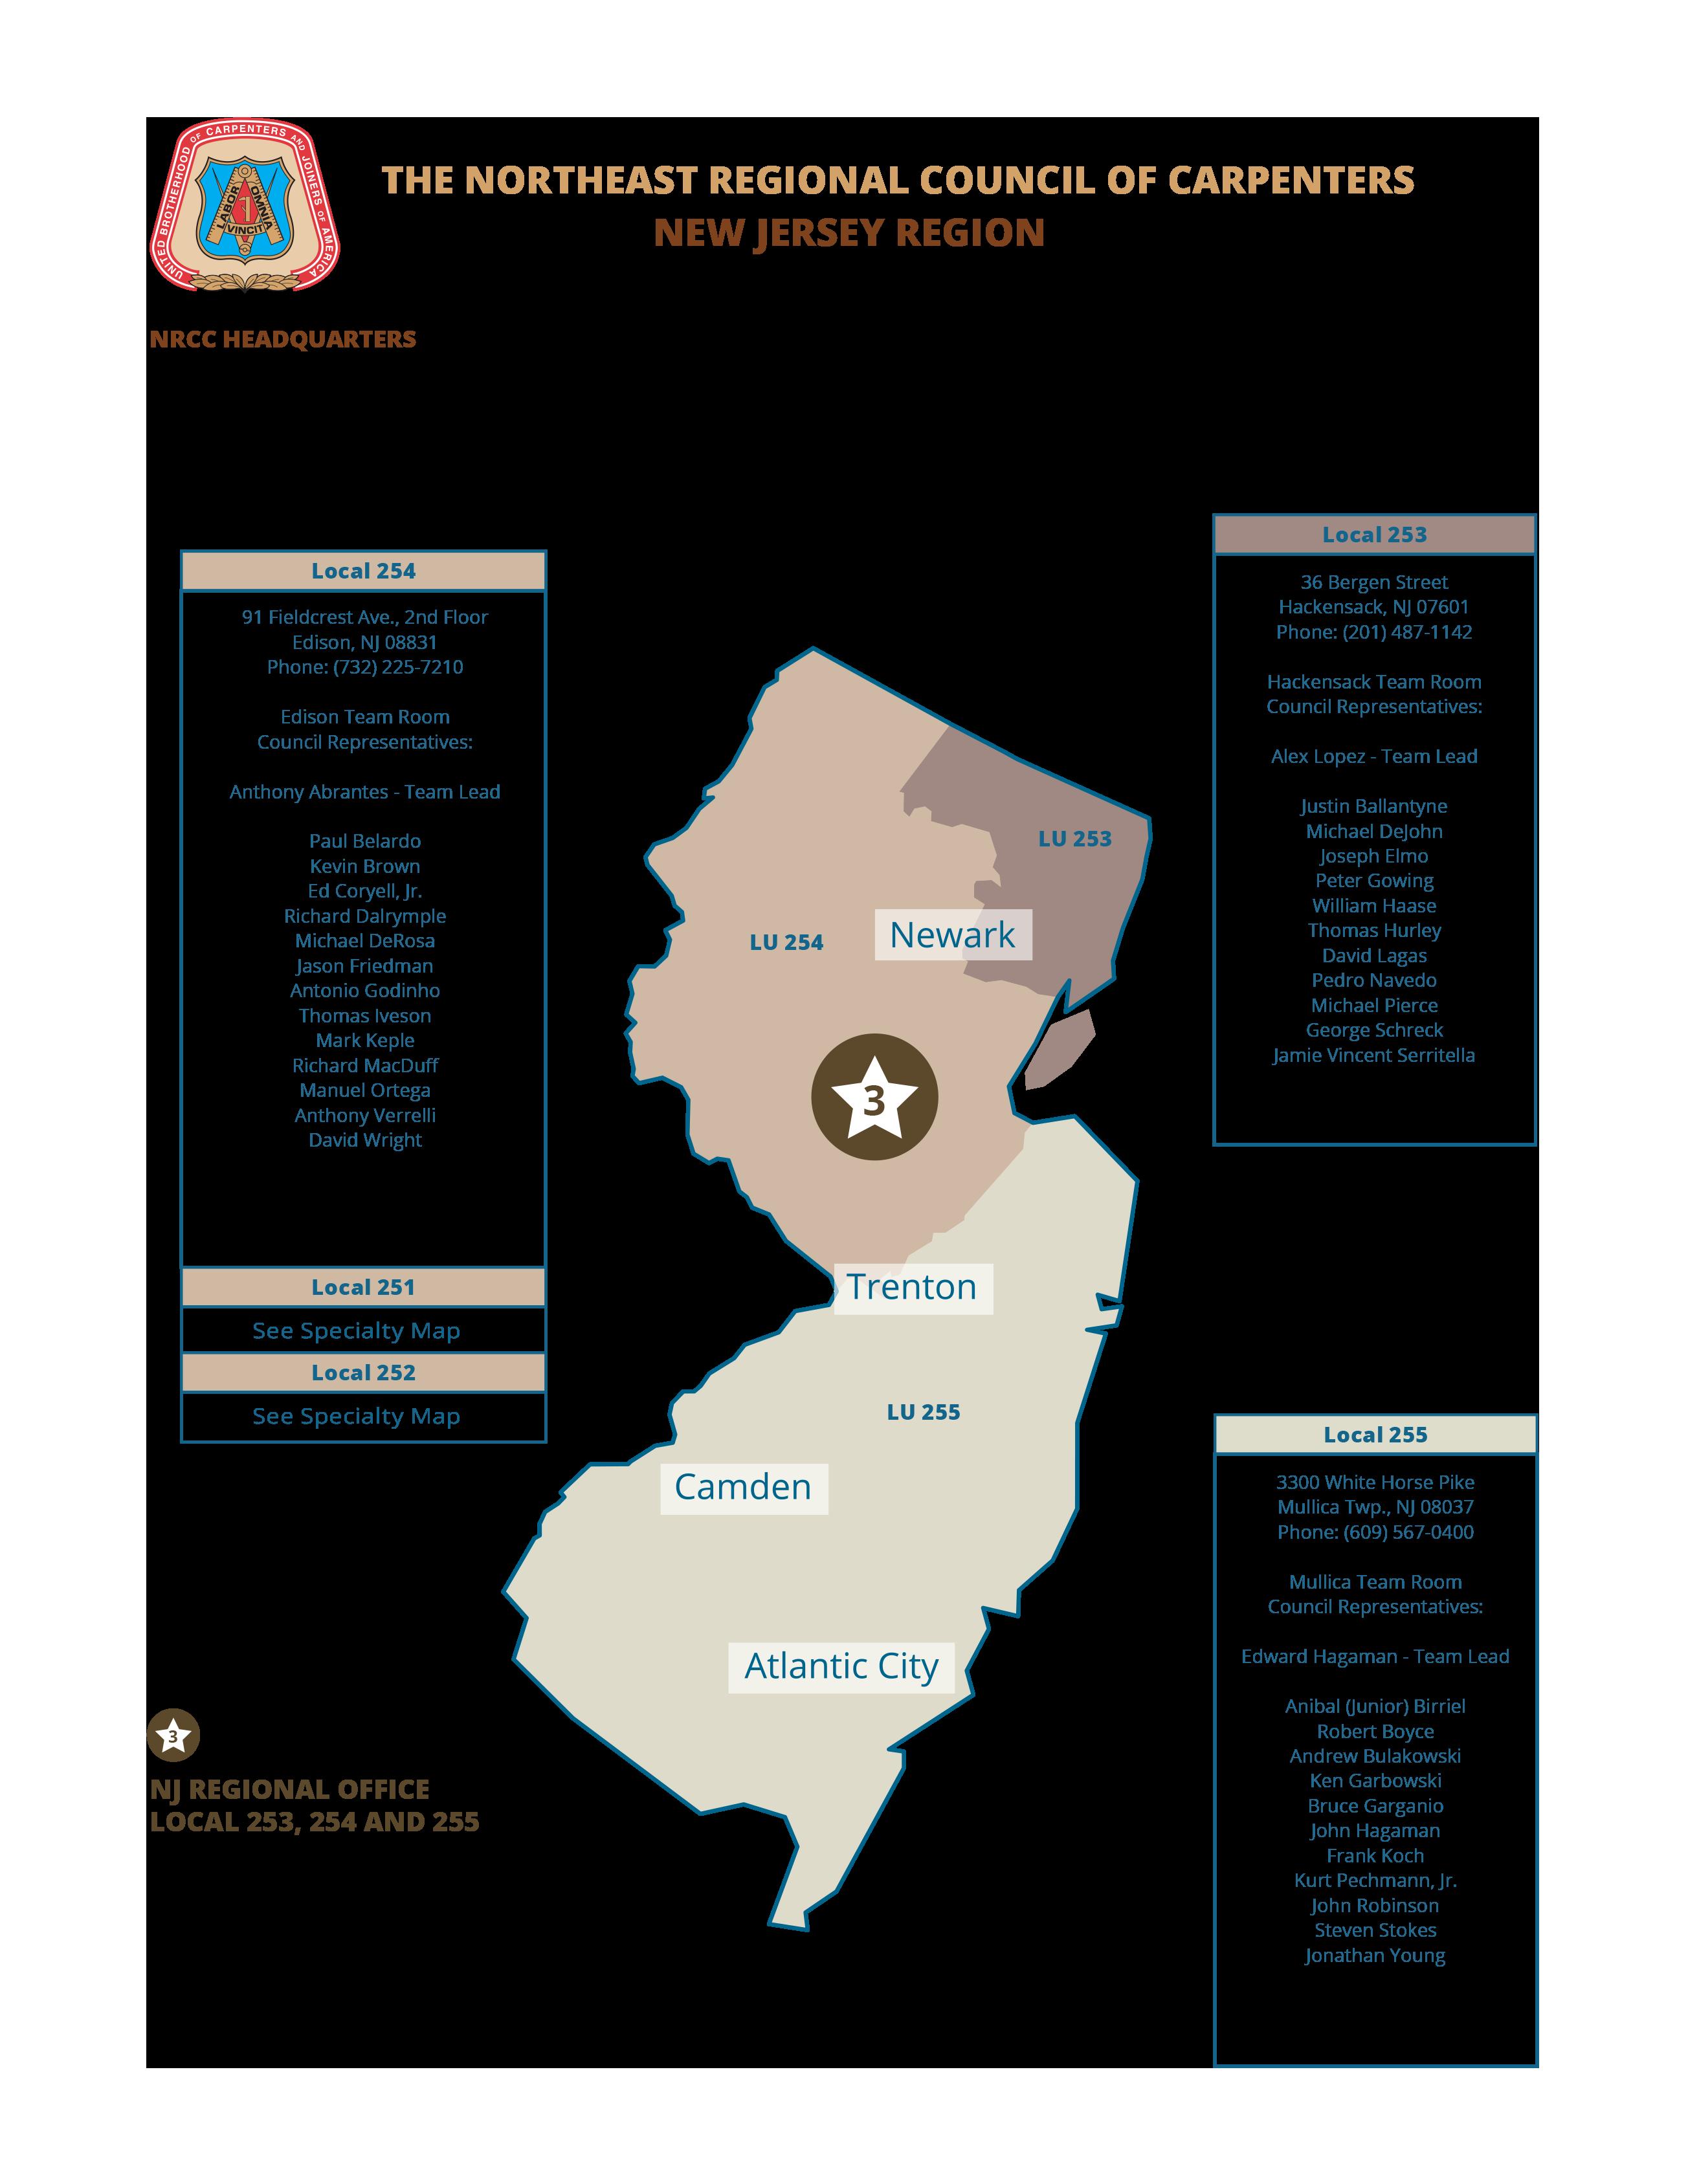 NRCC-Regional-Map-New-Jersey-v4_editable---10.16.17-(1).png